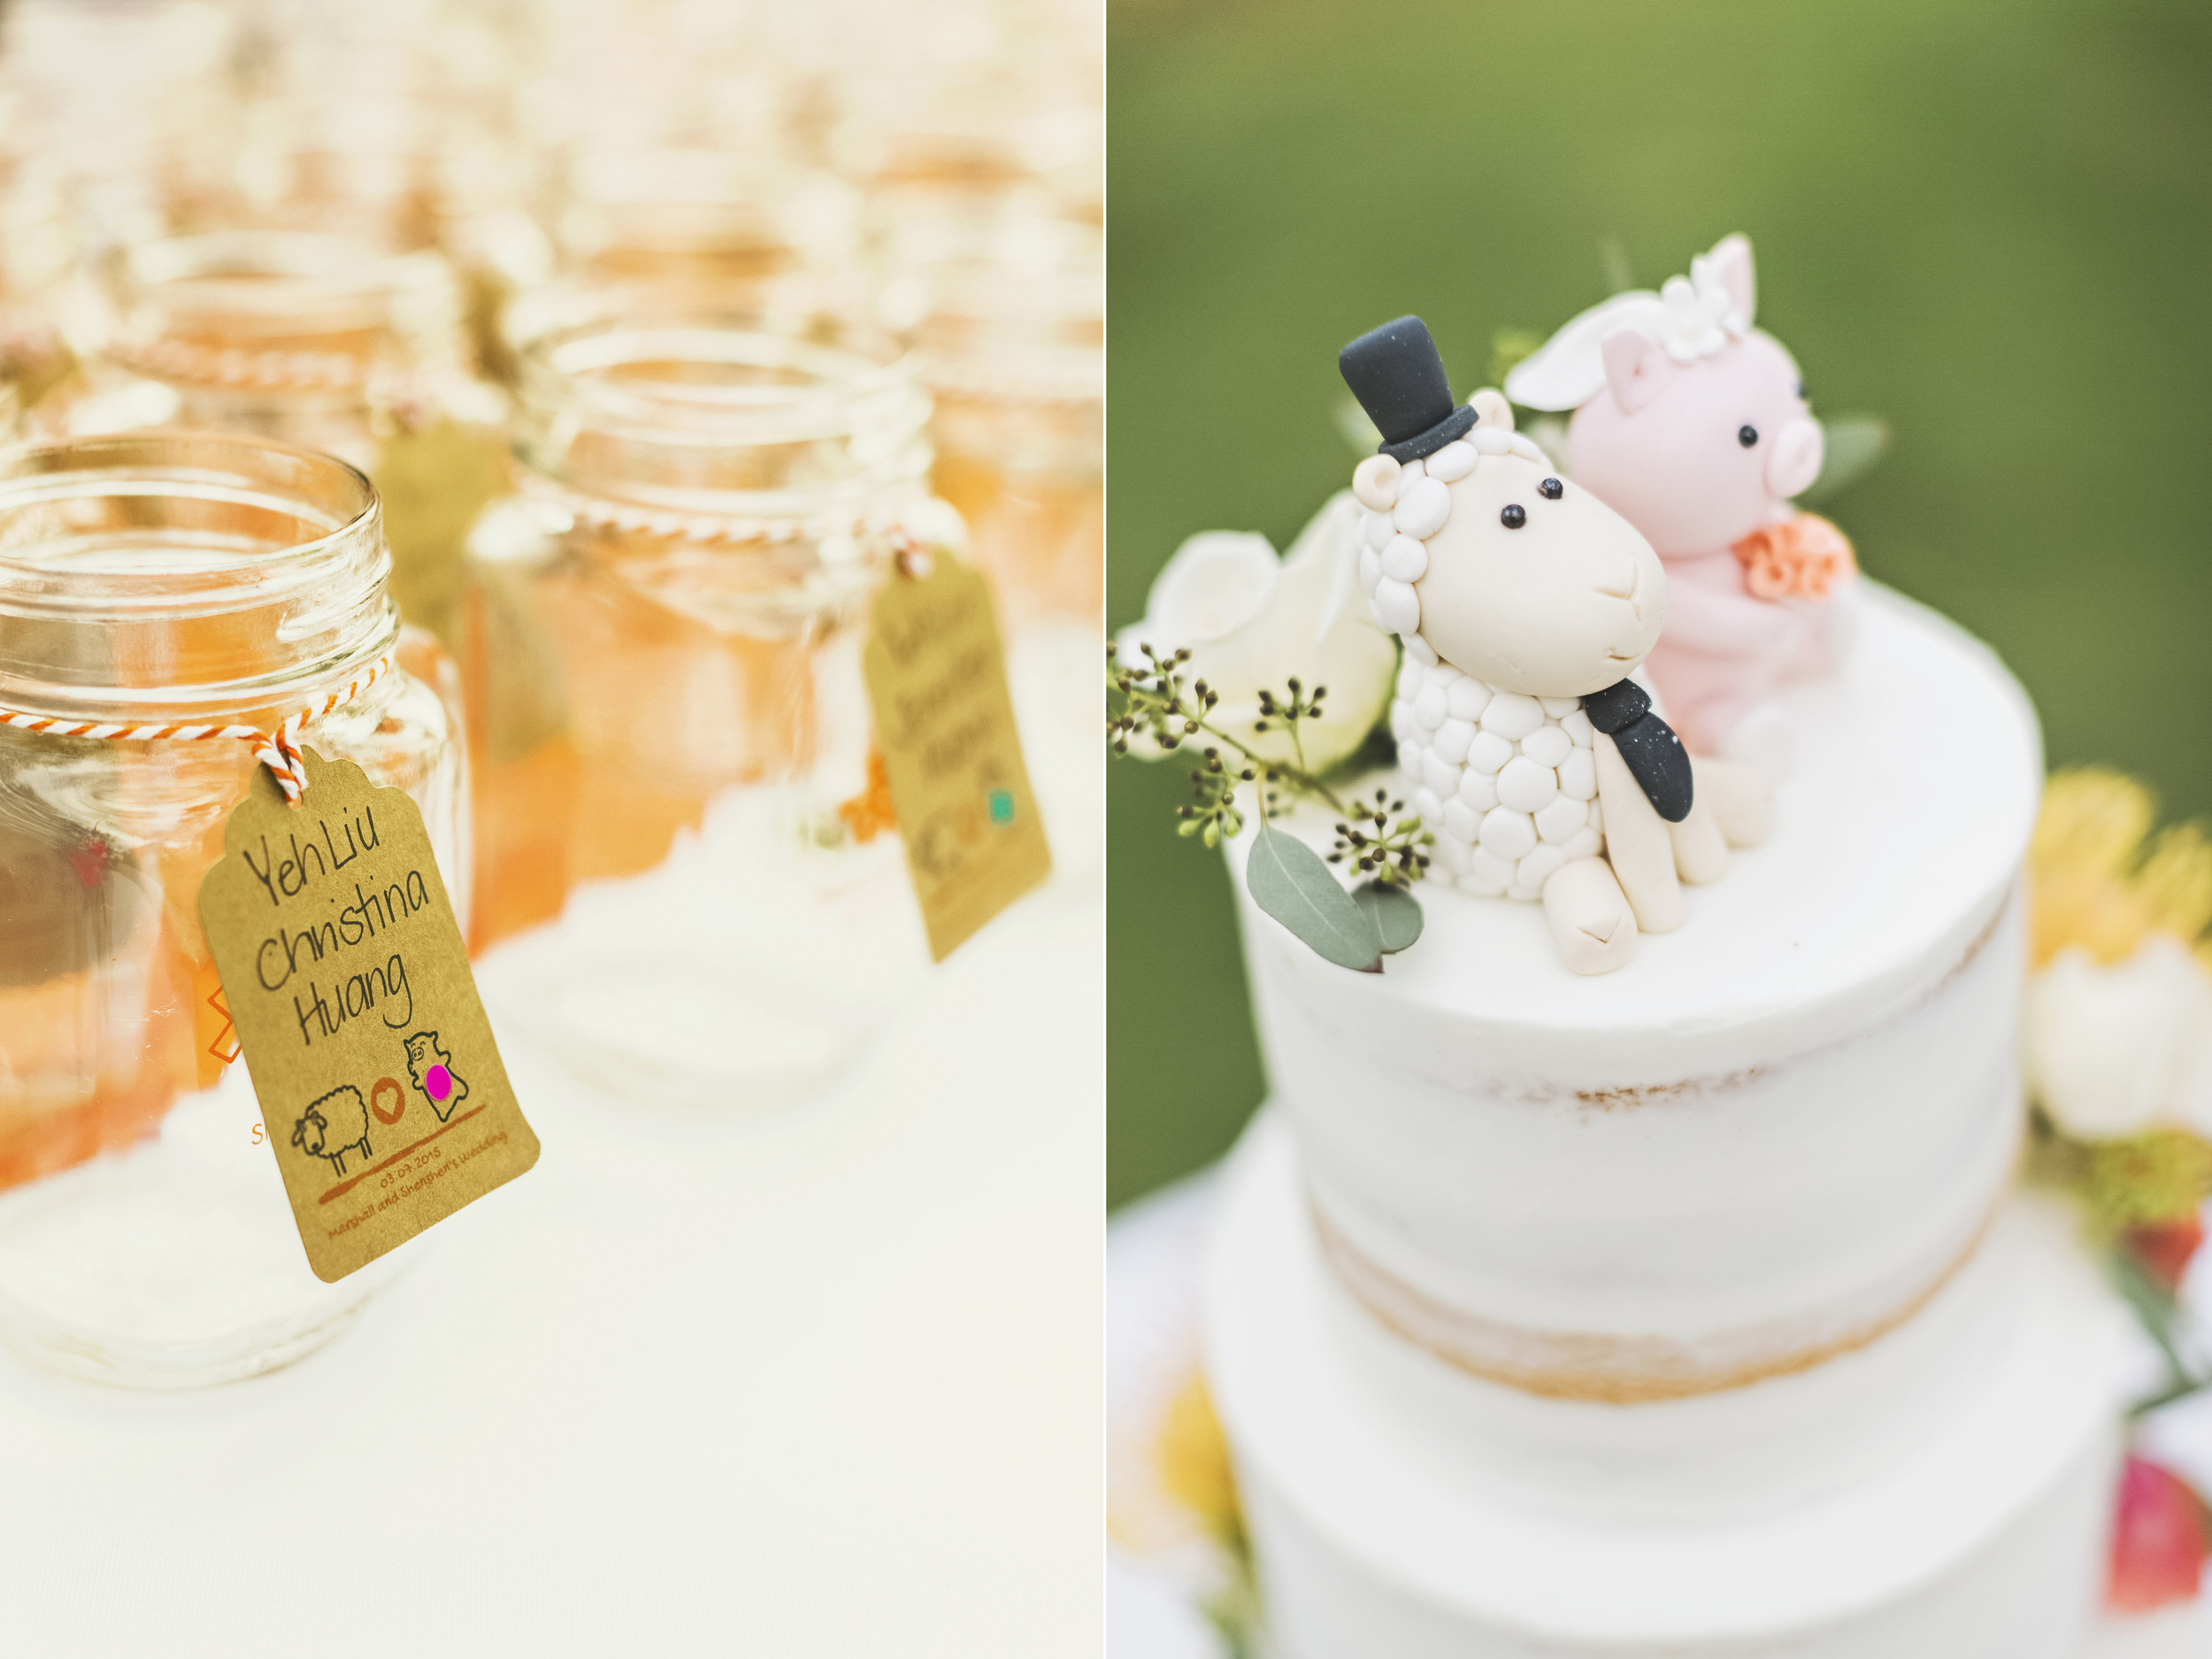 angie-diaz-photography-oahu-wedding-lanikuhonoa-shenshen-marshall-50.jpg